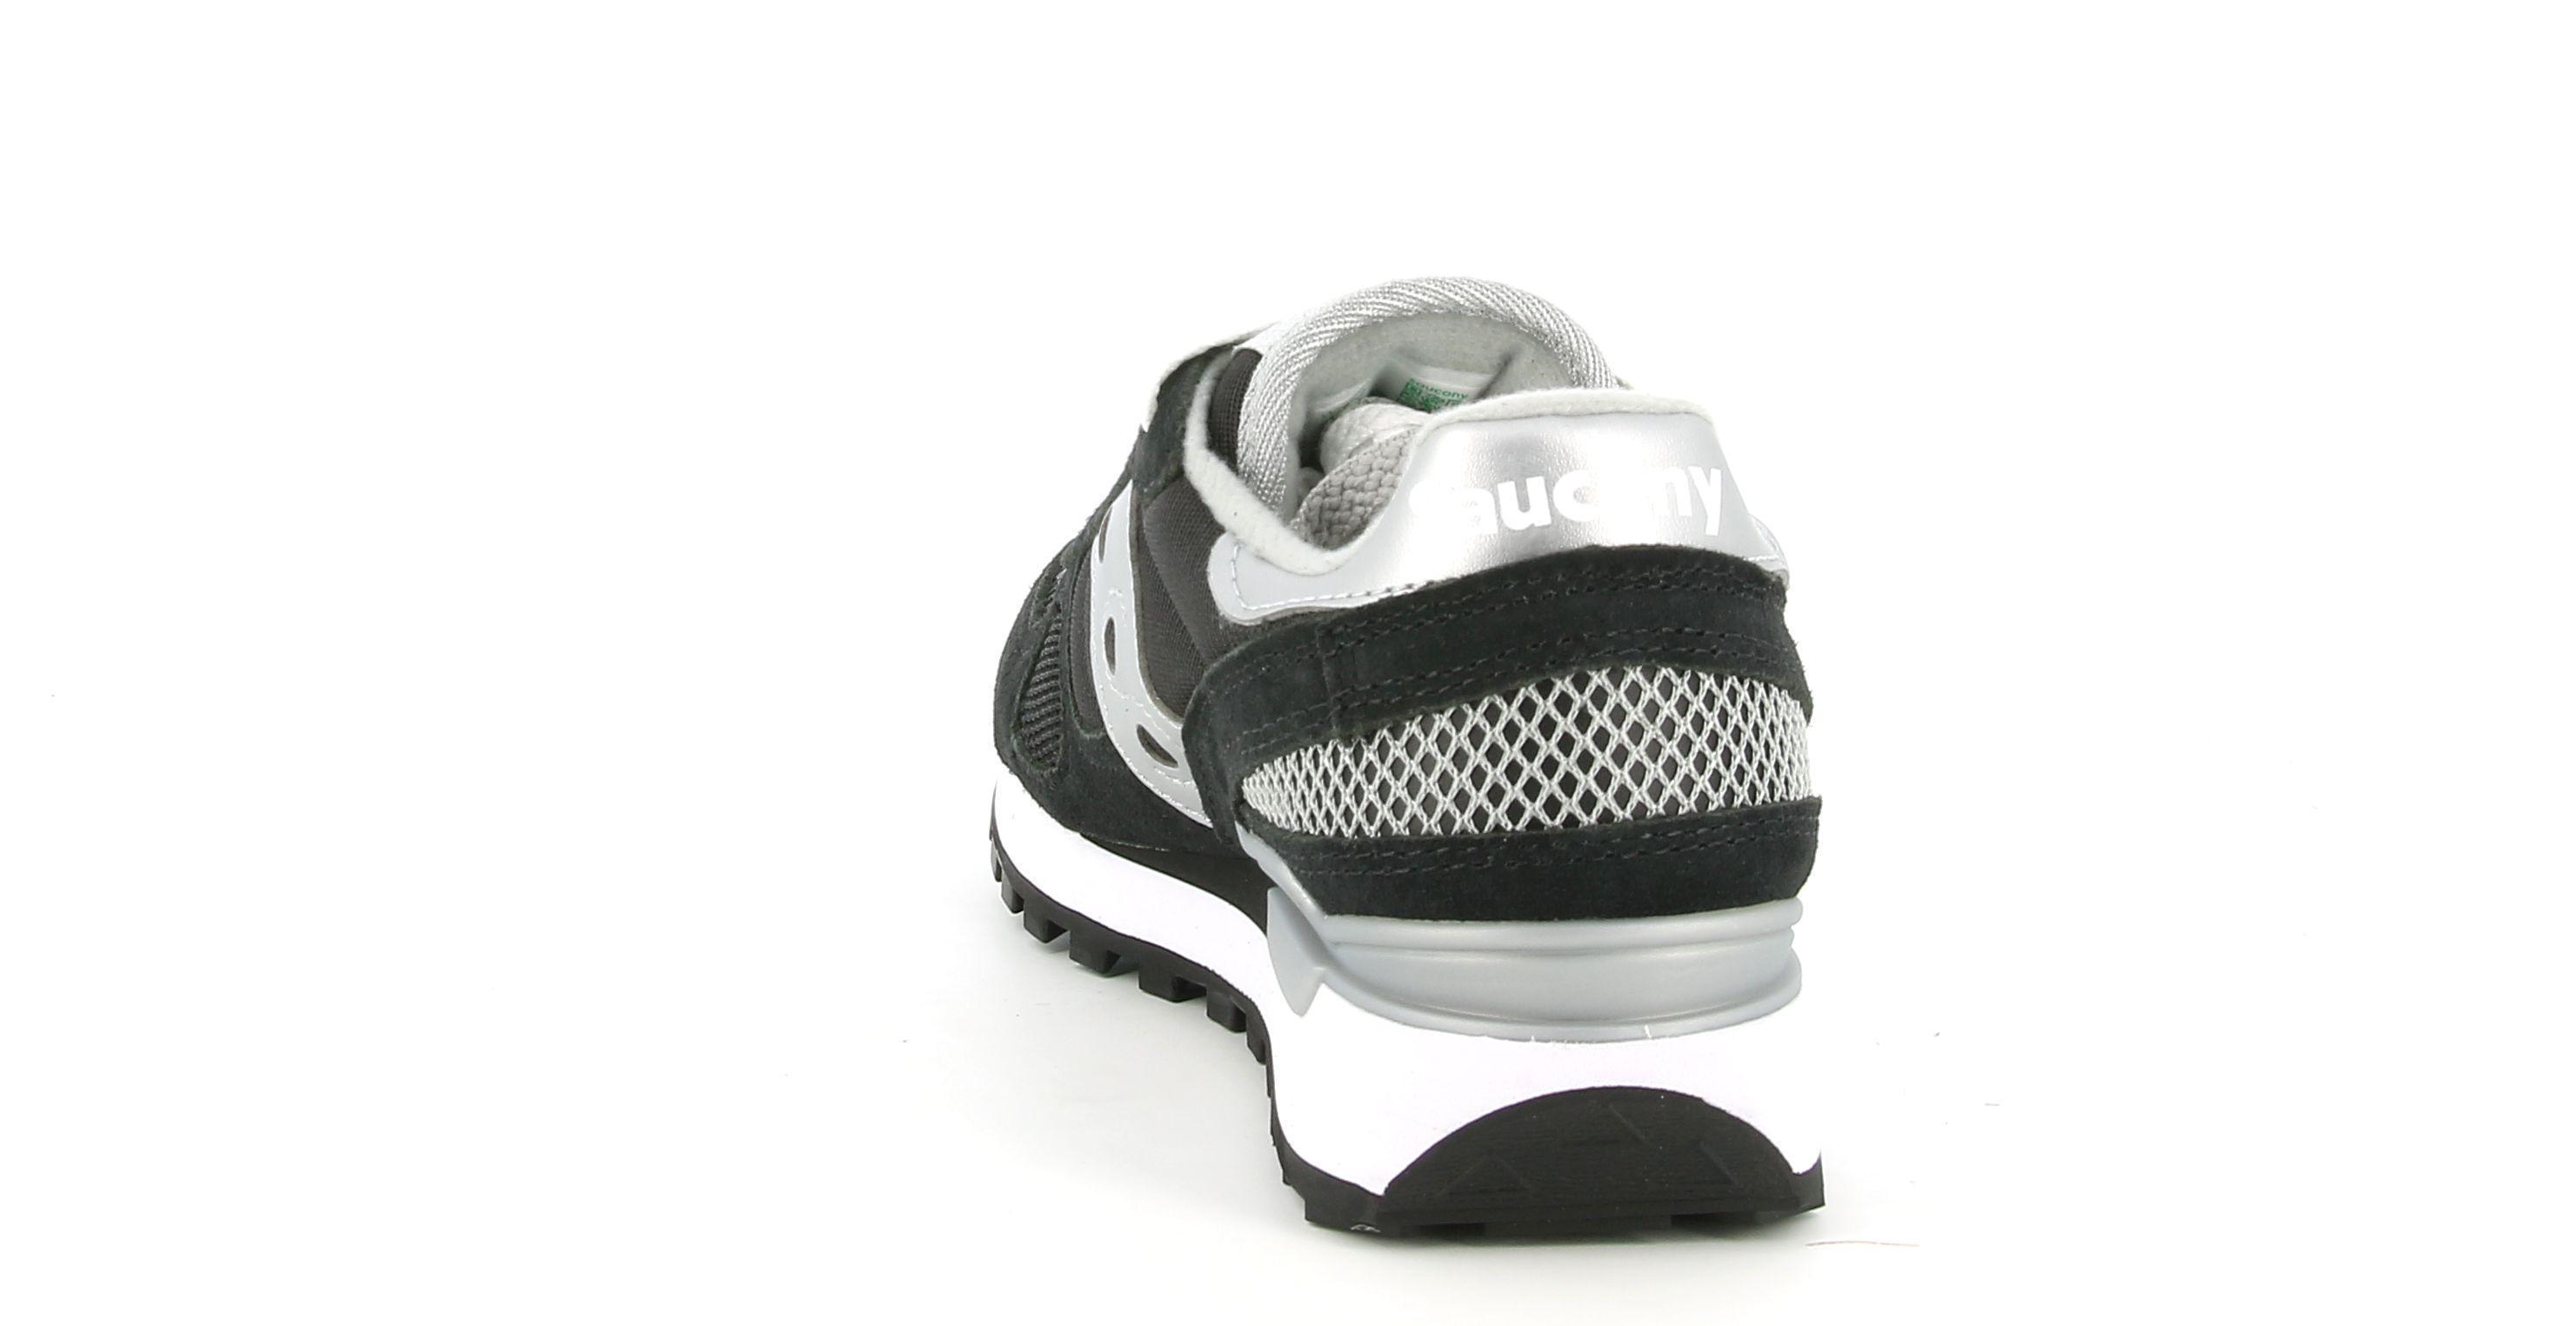 saucony saucony sneakers shadow  blk/sil/rep s1108-671 nero argento